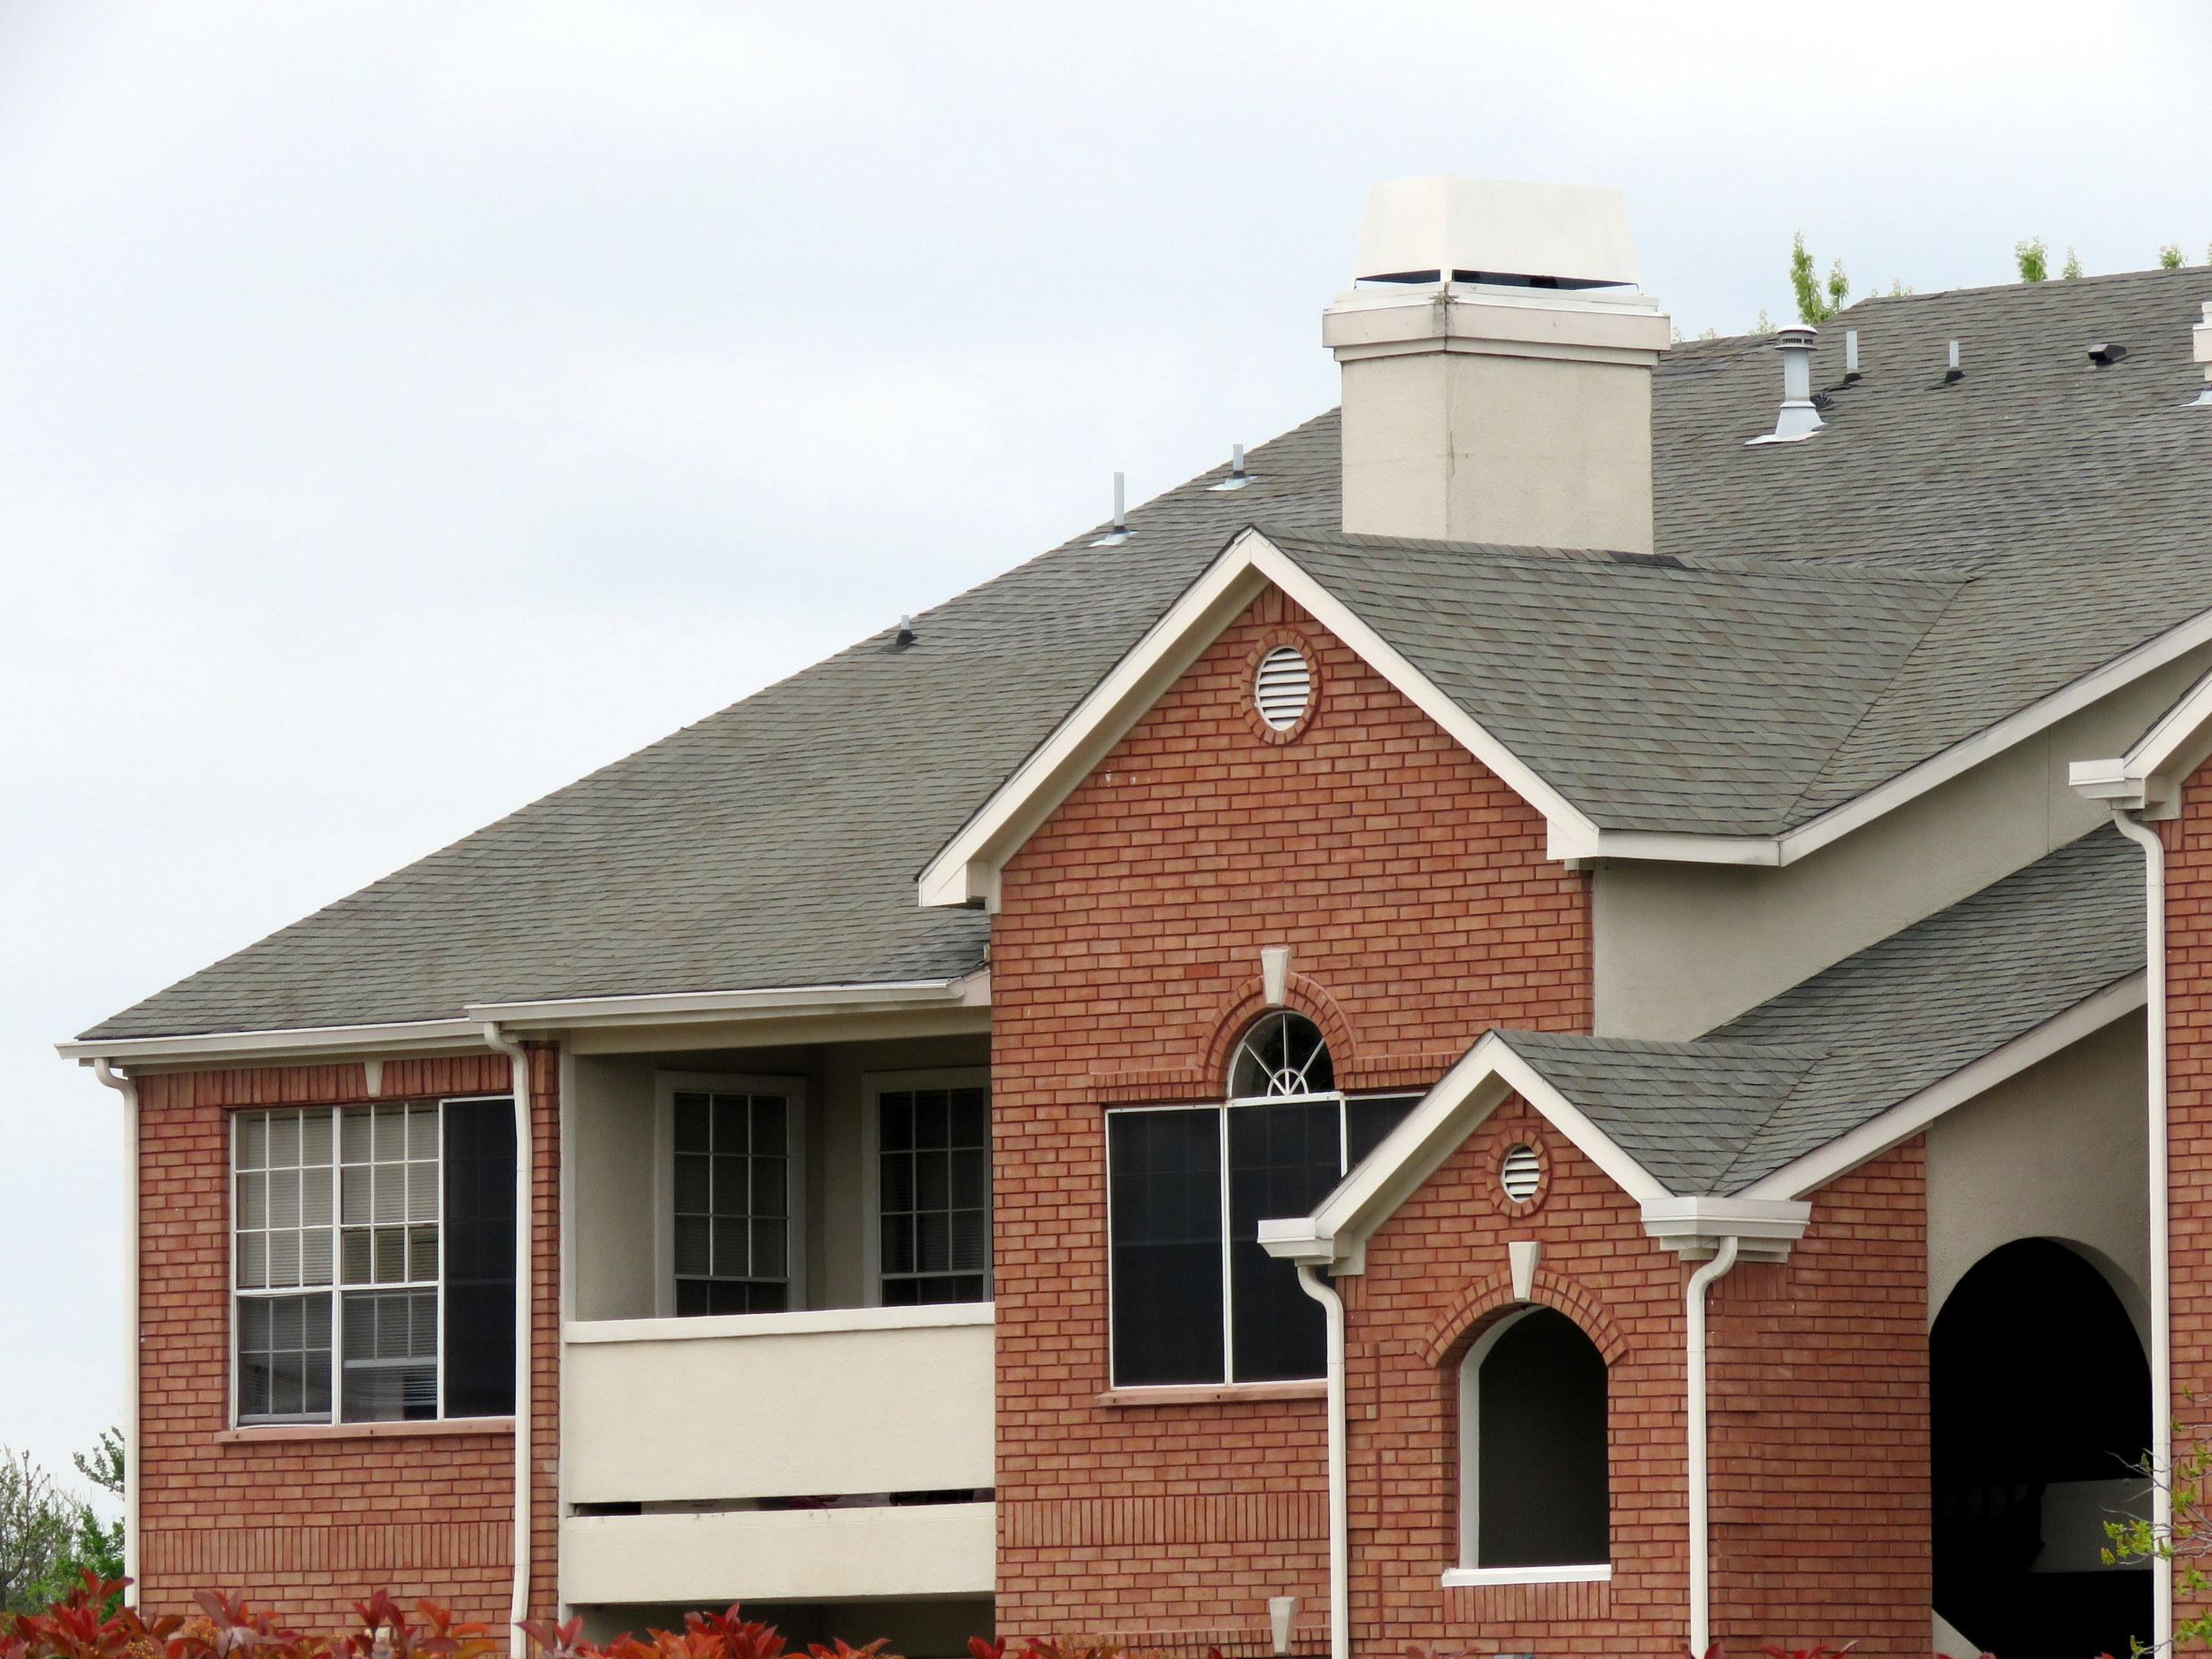 RO Steep-Sloped Roofs 1.JPG